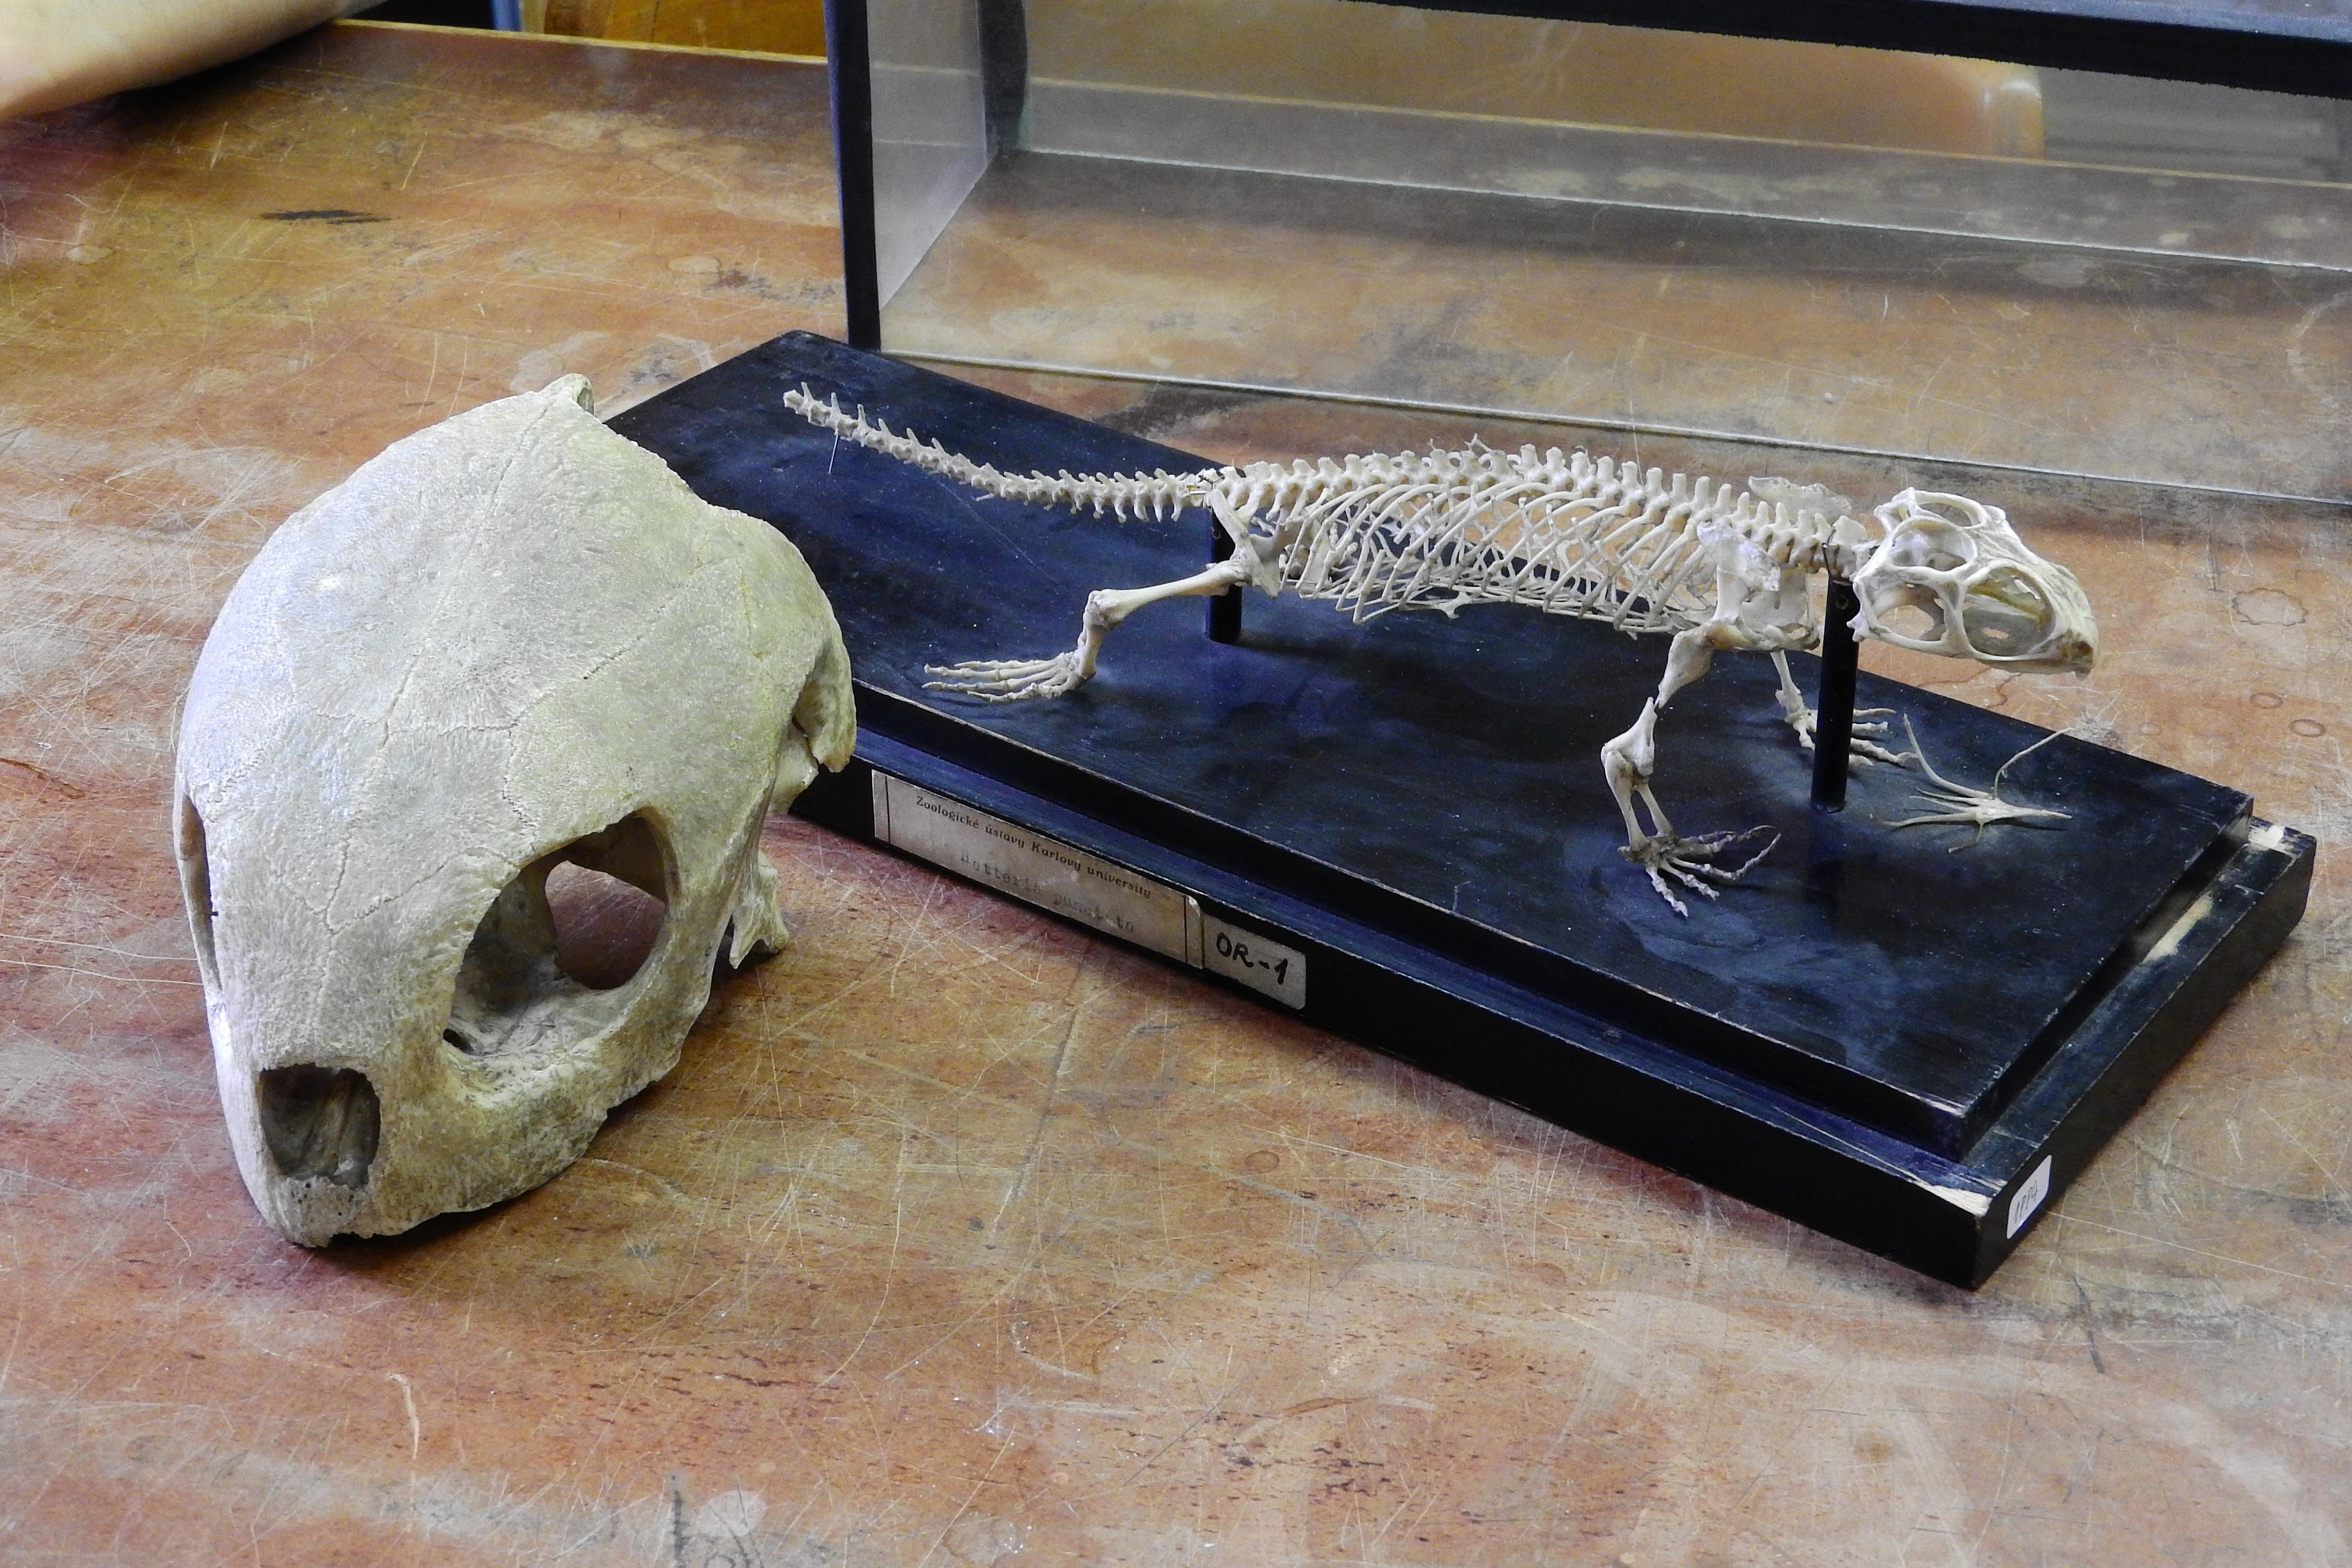 Fotos gratis : cráneo, escultura, esqueleto, tallado, Tortuga carey ...